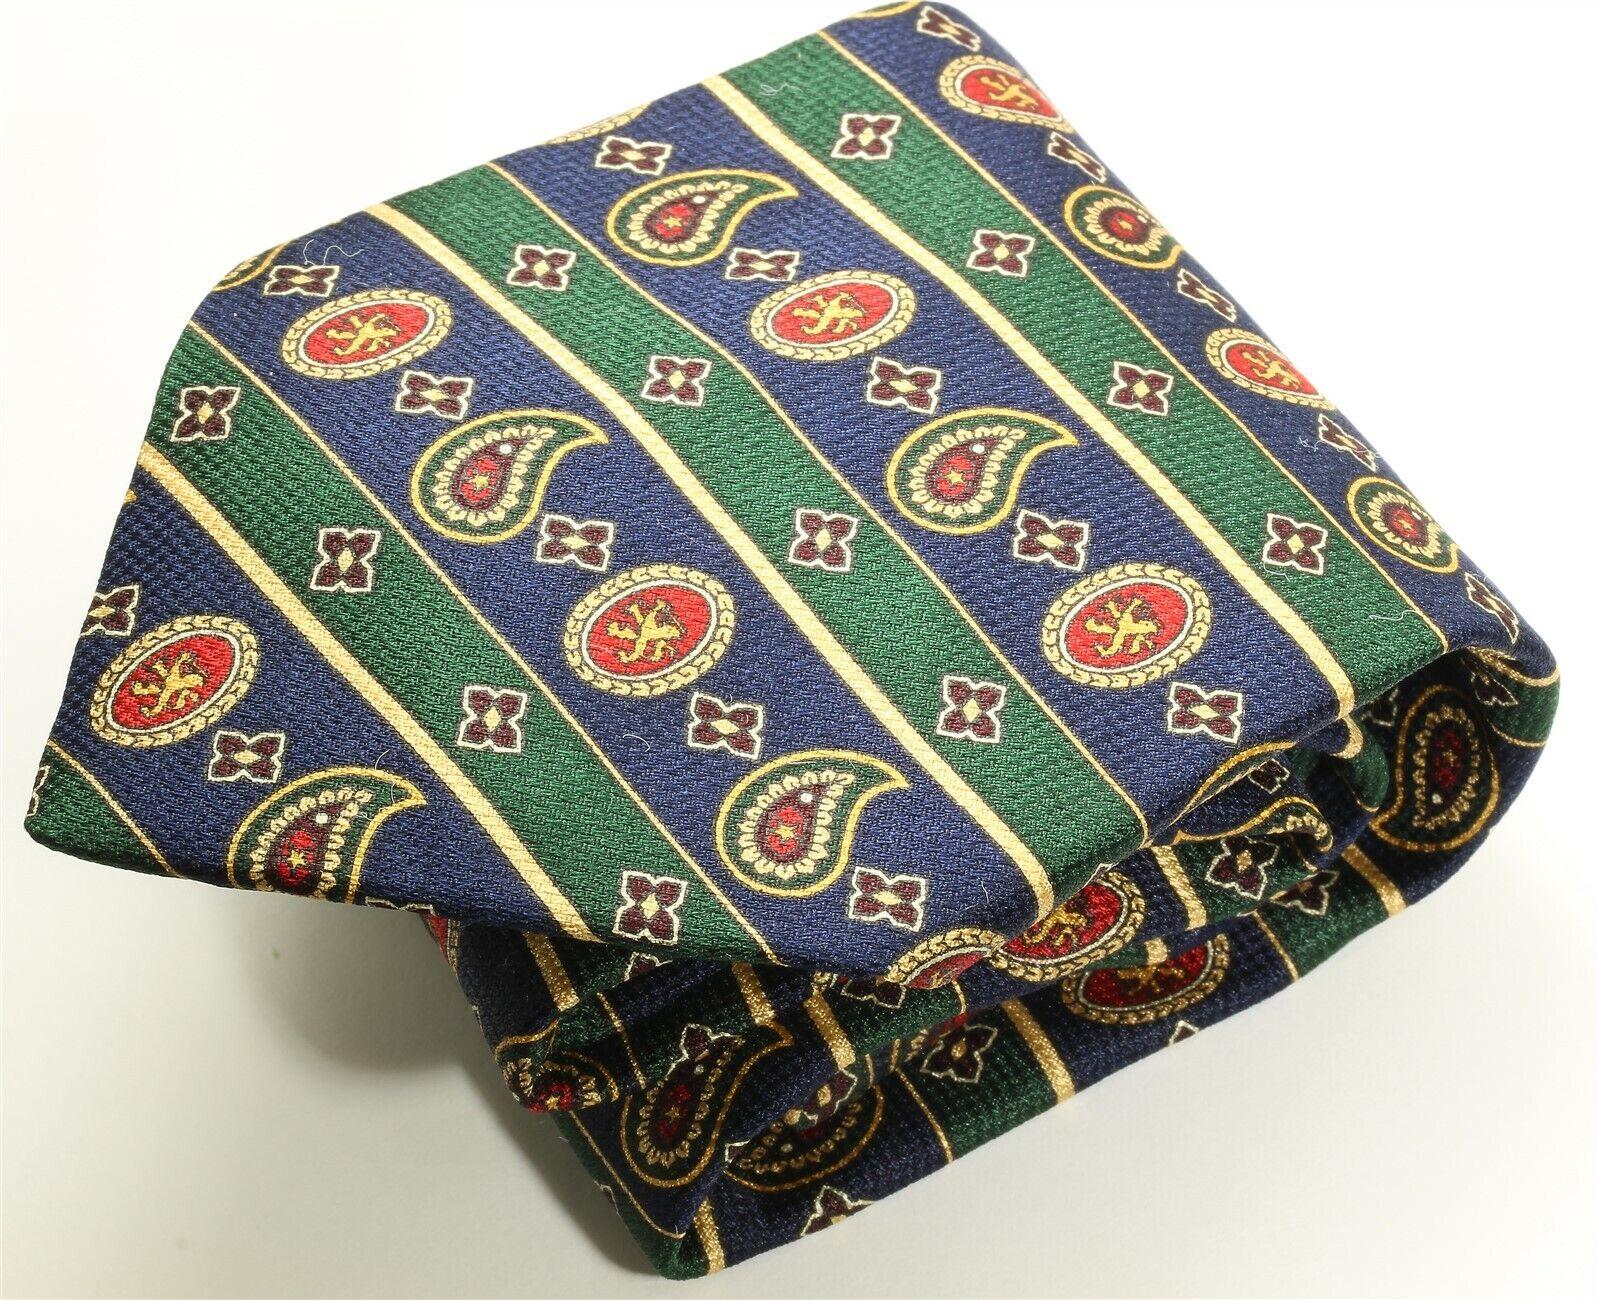 Tommy Hilfiger Blue Green Lion Crests Striped Printed Silk Tie